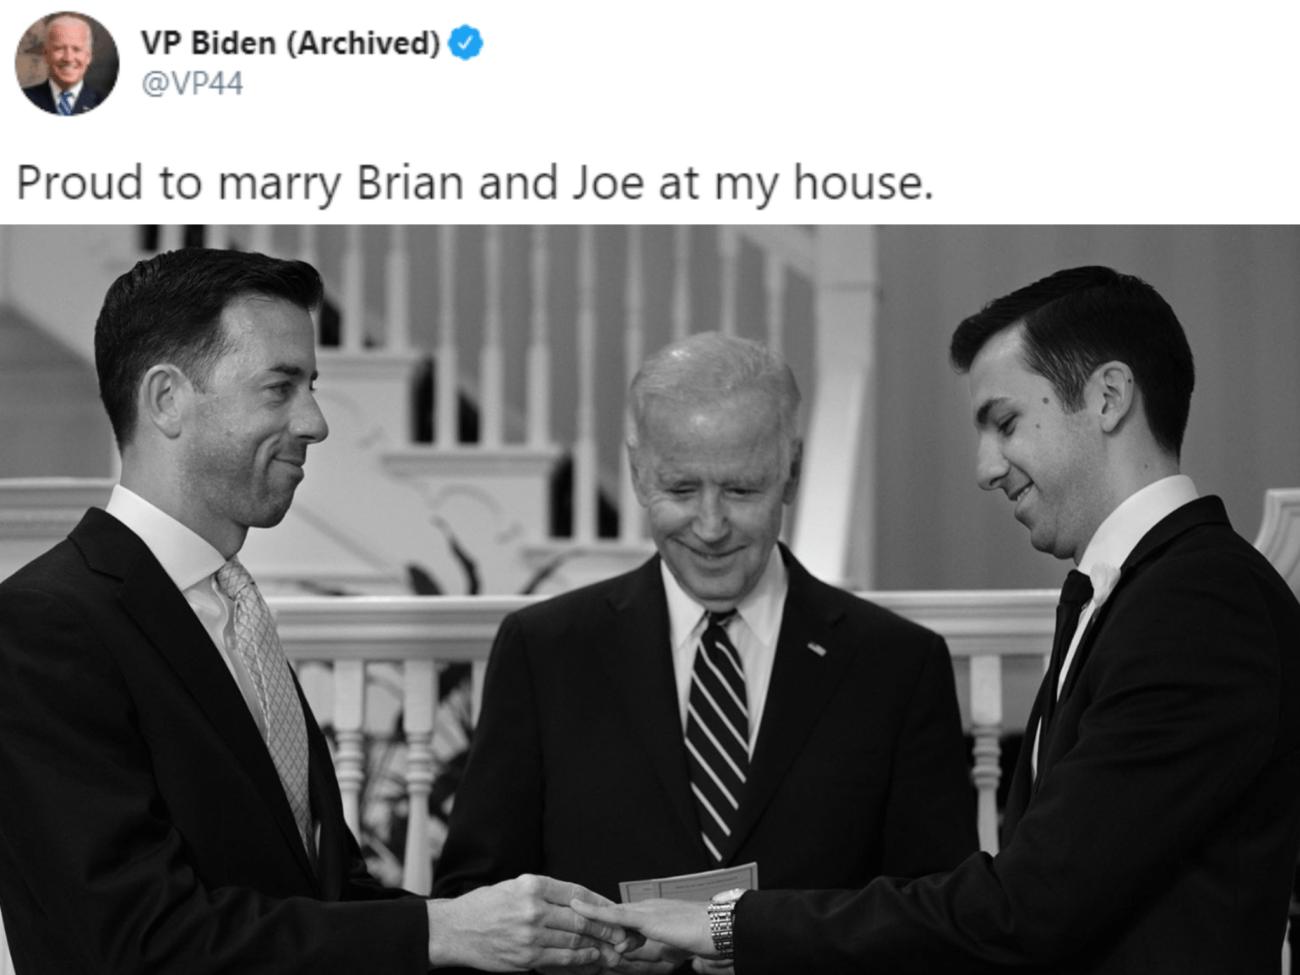 Joe Biden proud to marry gay couple